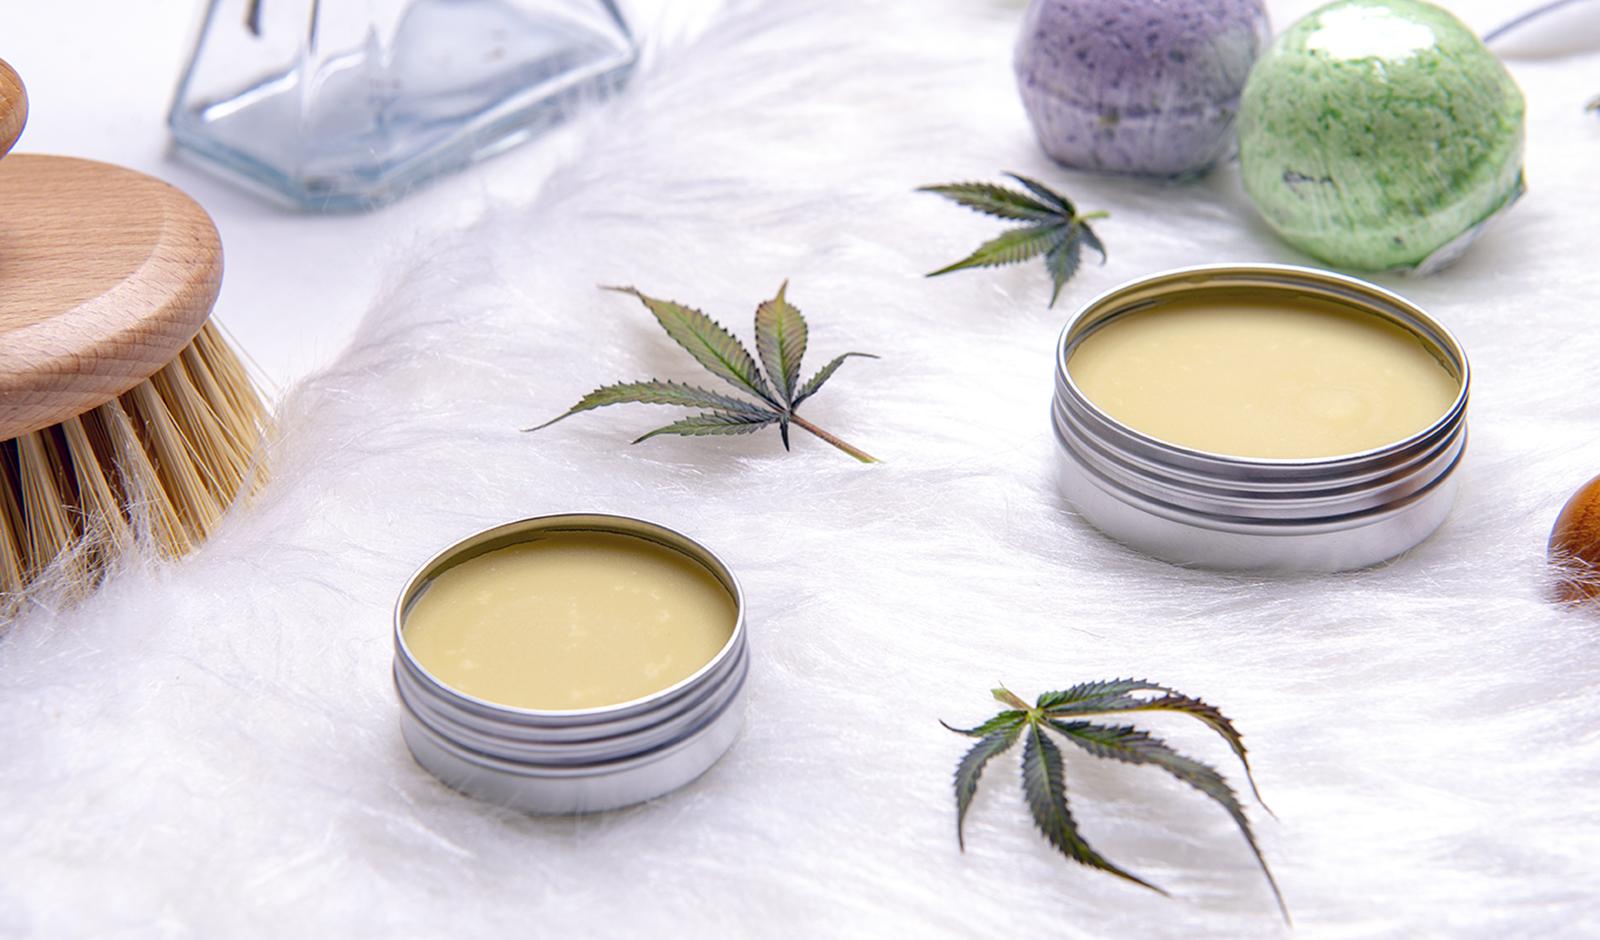 Assortment of cannabis topicals with bath bombs and marijuana sa